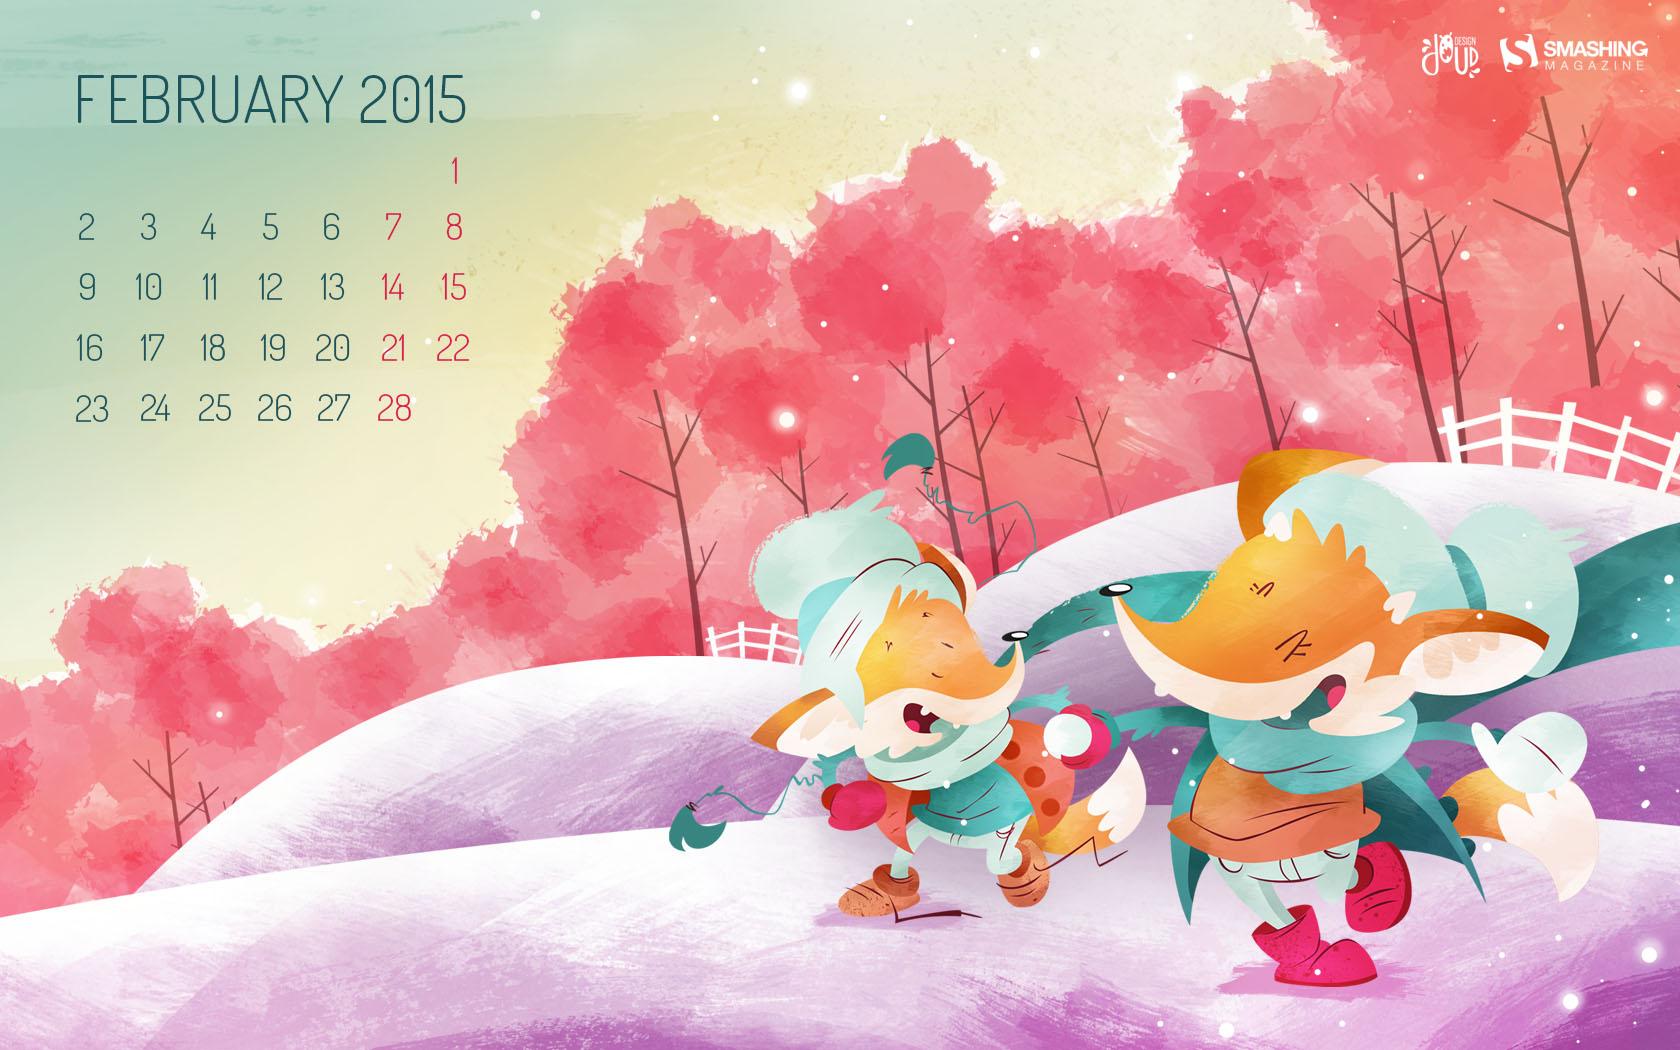 Desktop Wallpaper Calendars February 2015 Smashing Magazine 1680x1050